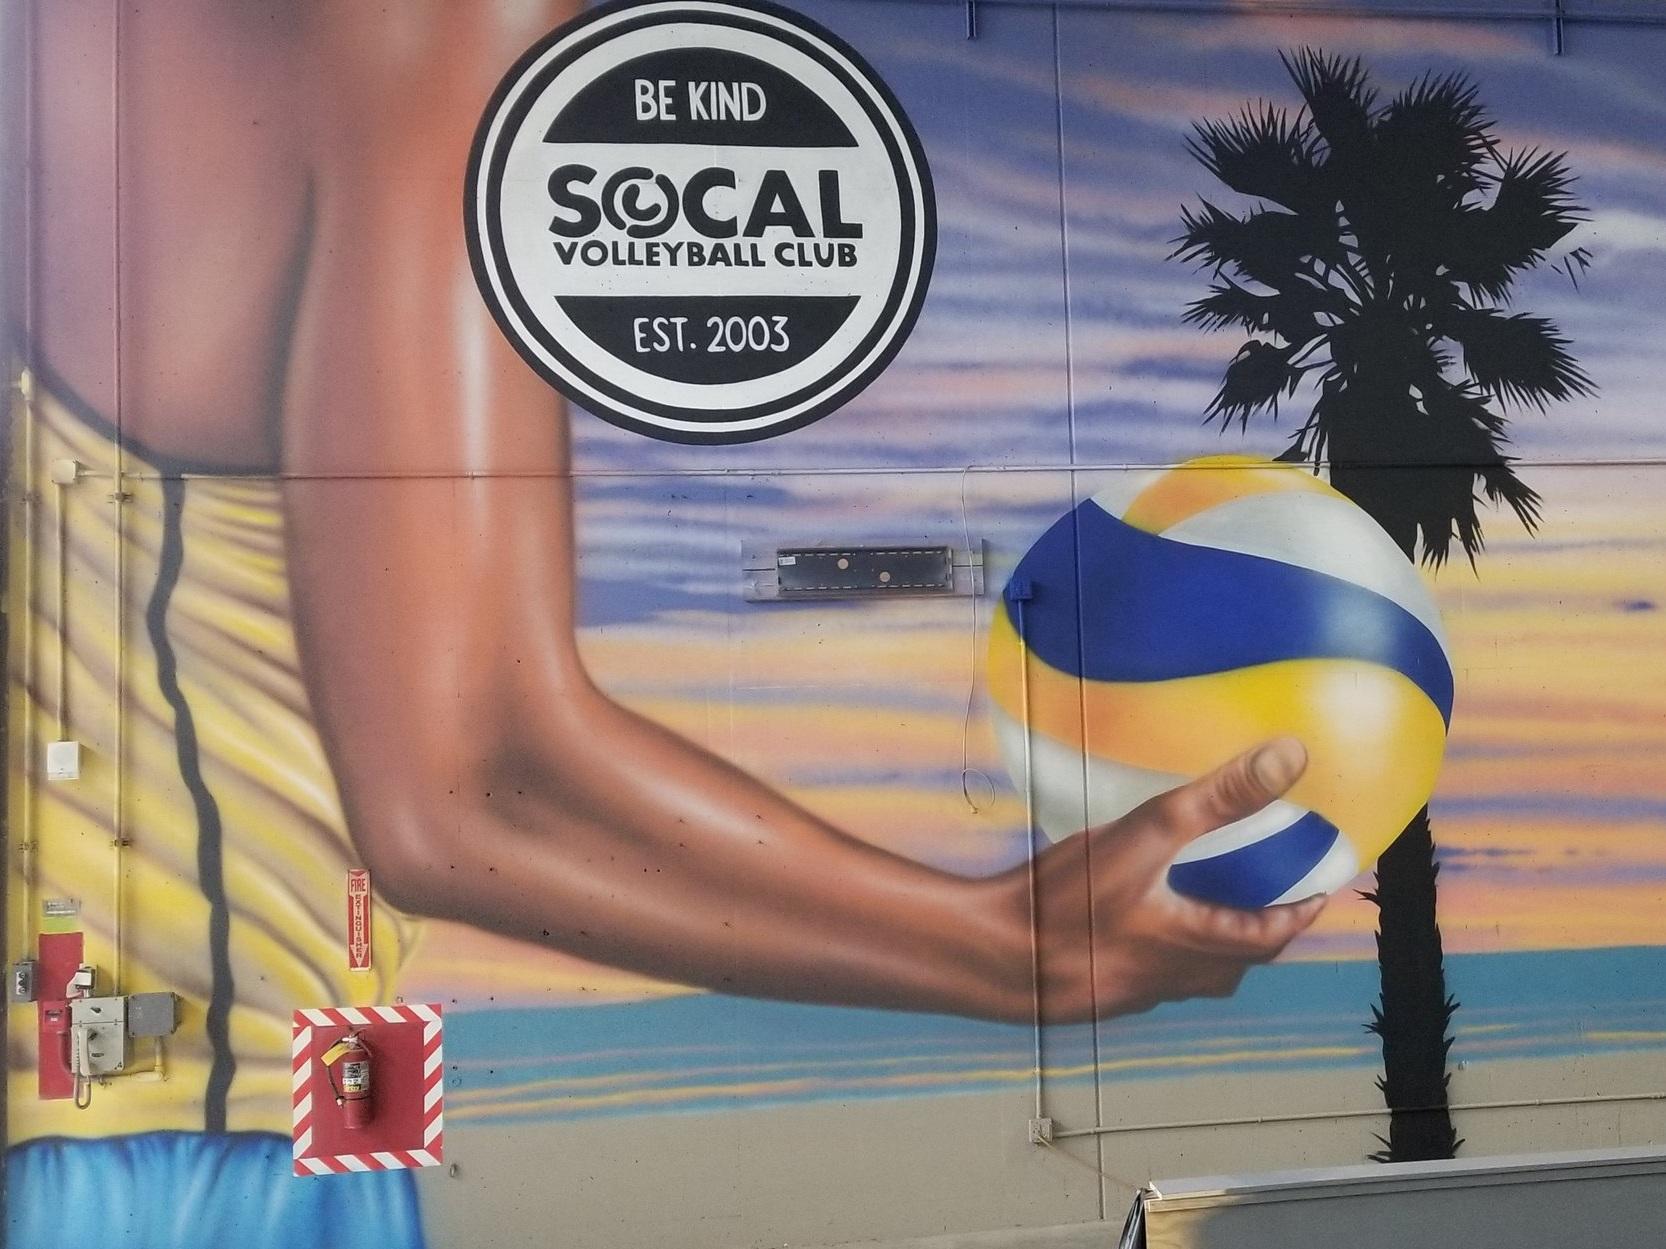 SoCal Volleyball Club